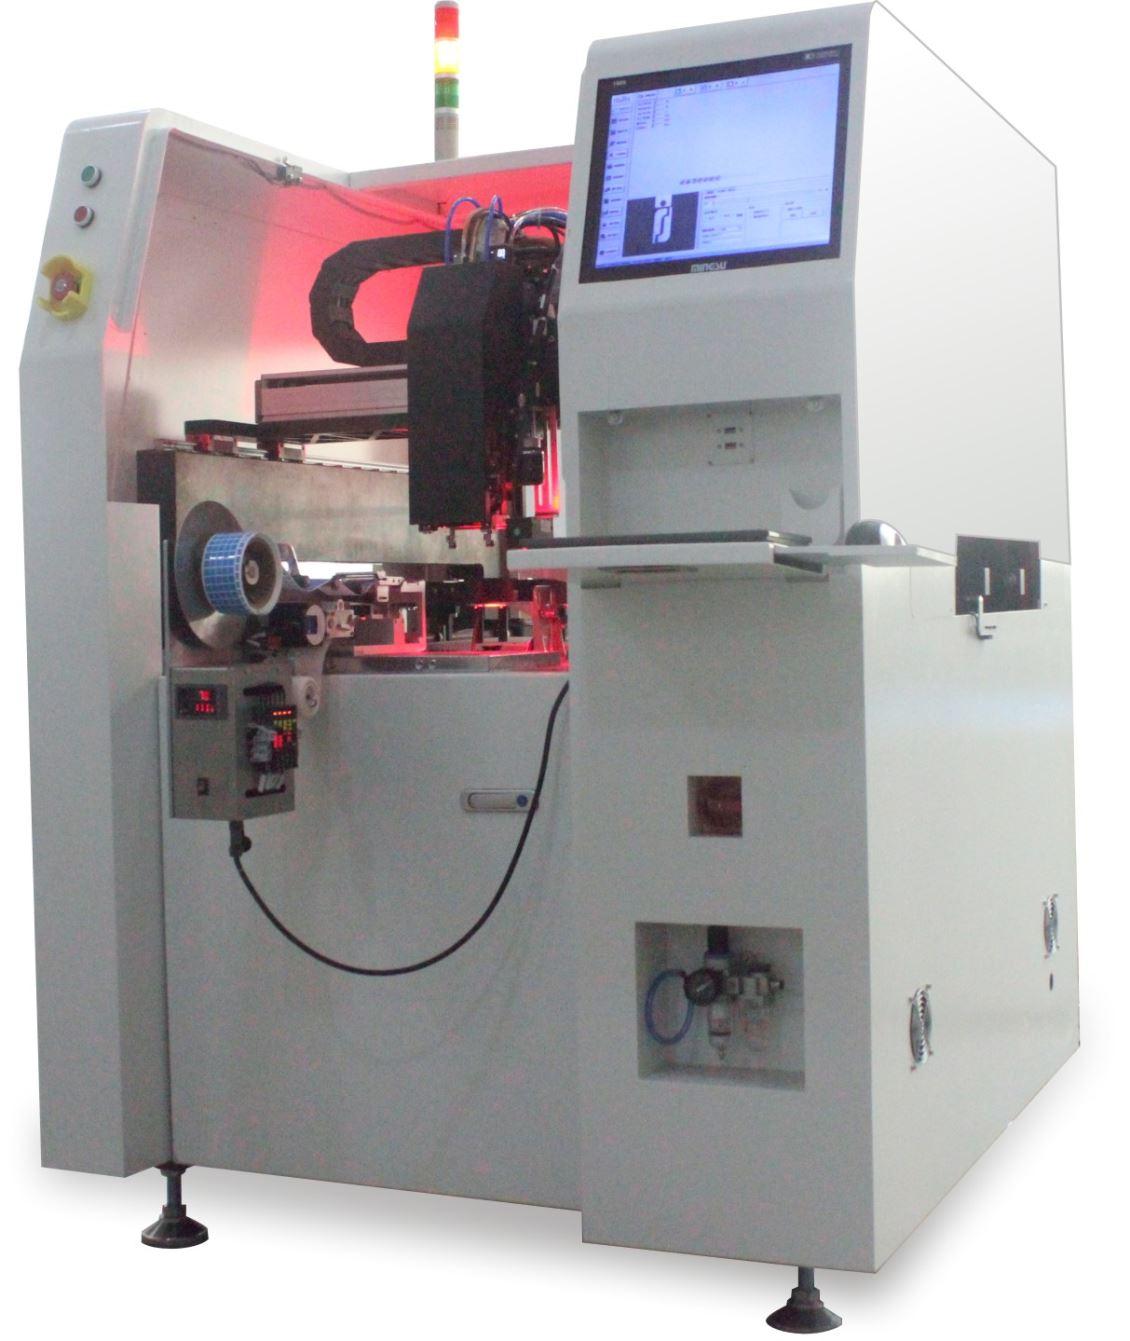 SMT贴片机,全自动贴标机,SMT生产线,视觉点胶机,SMT自动点胶机